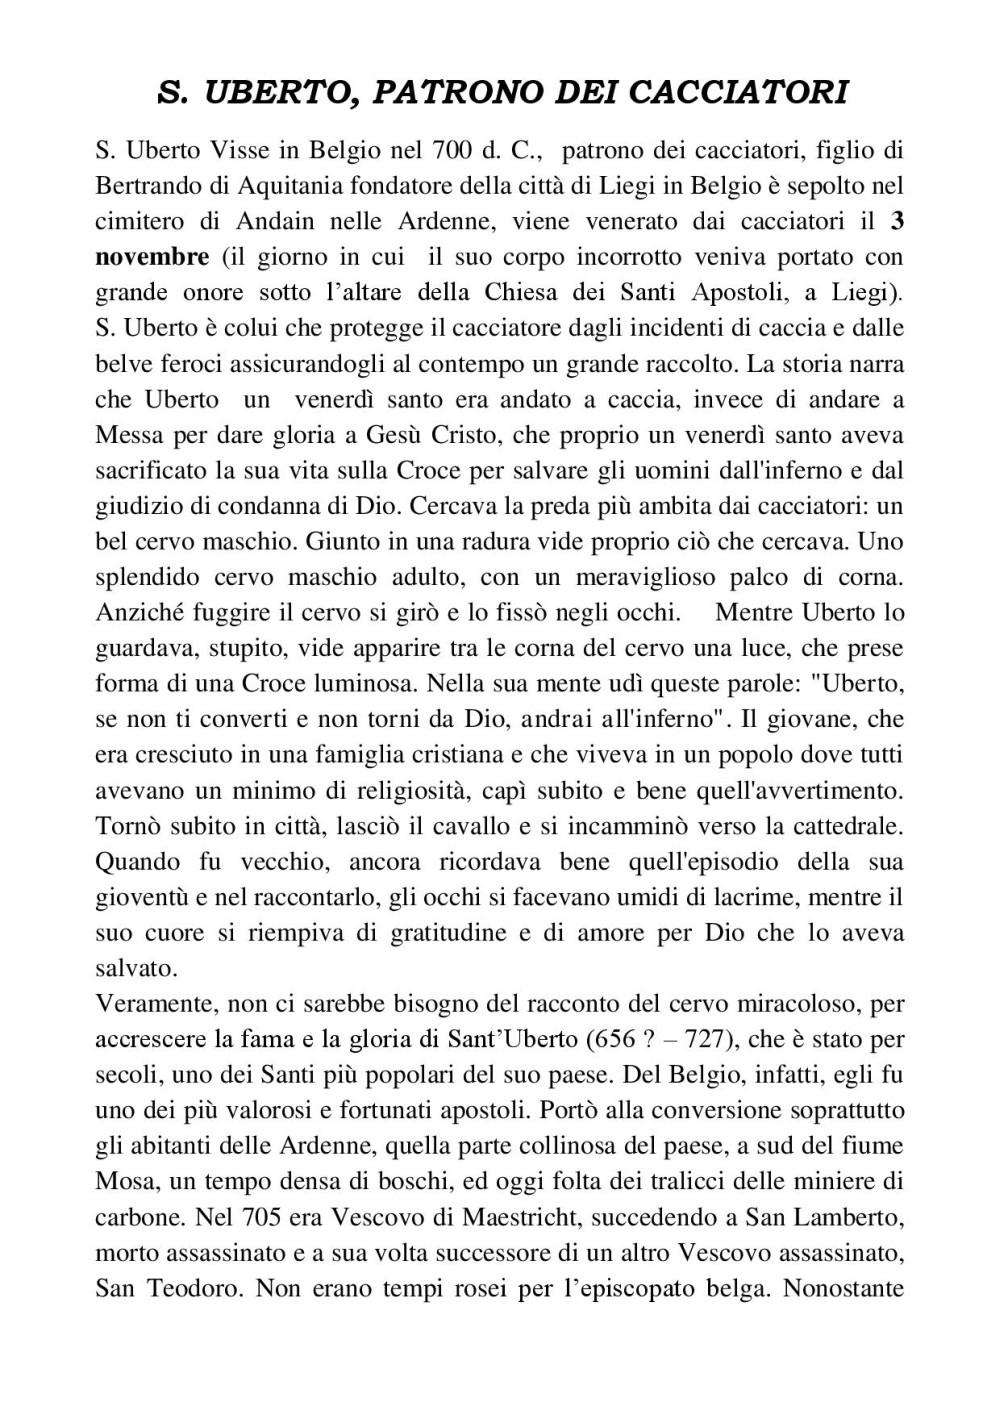 Vita di San Uberto, pagina 2